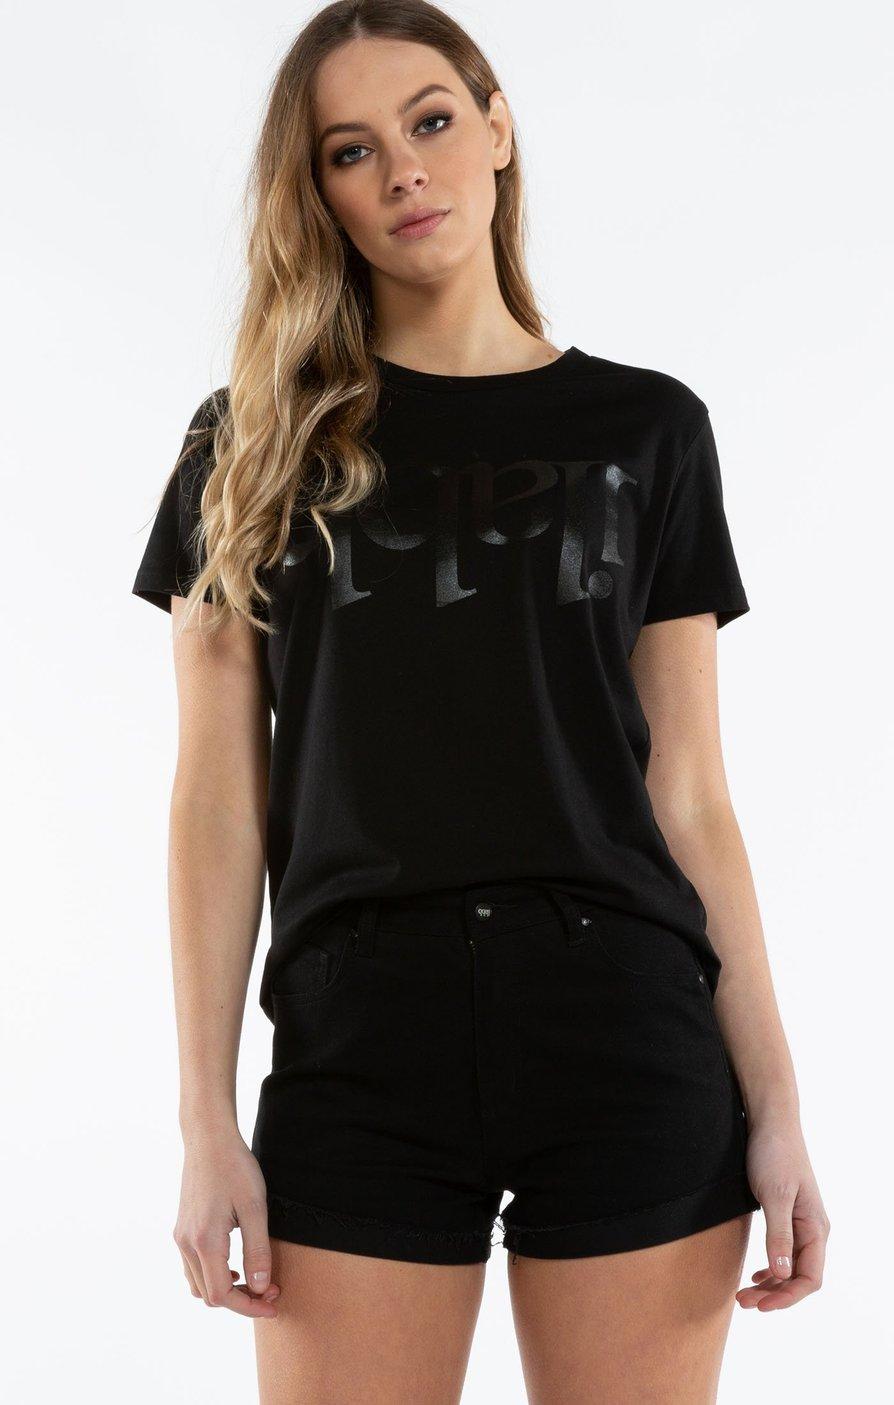 Capsize Tee Womens - Black/Black Tシャツ